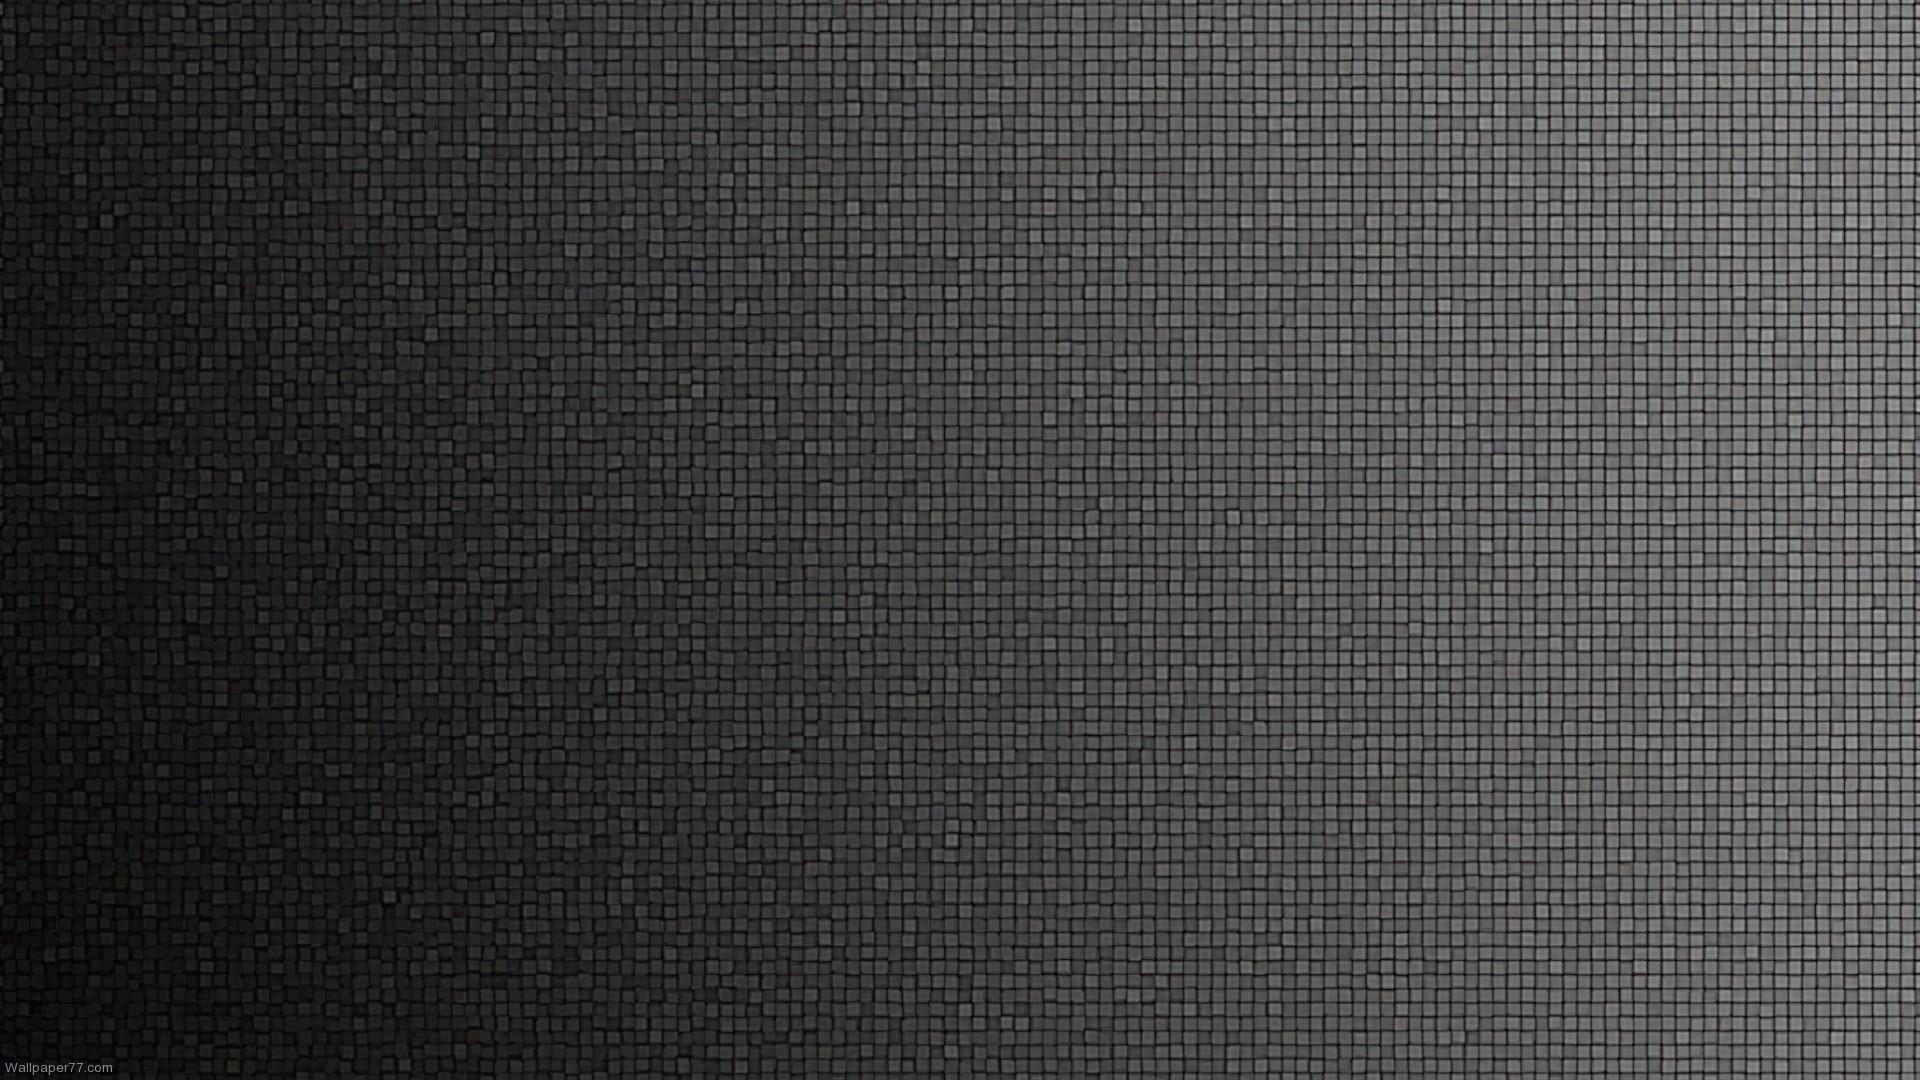 ipad 3 wallpaper ipad wallpaper retina display wallpaper the new 1920x1080